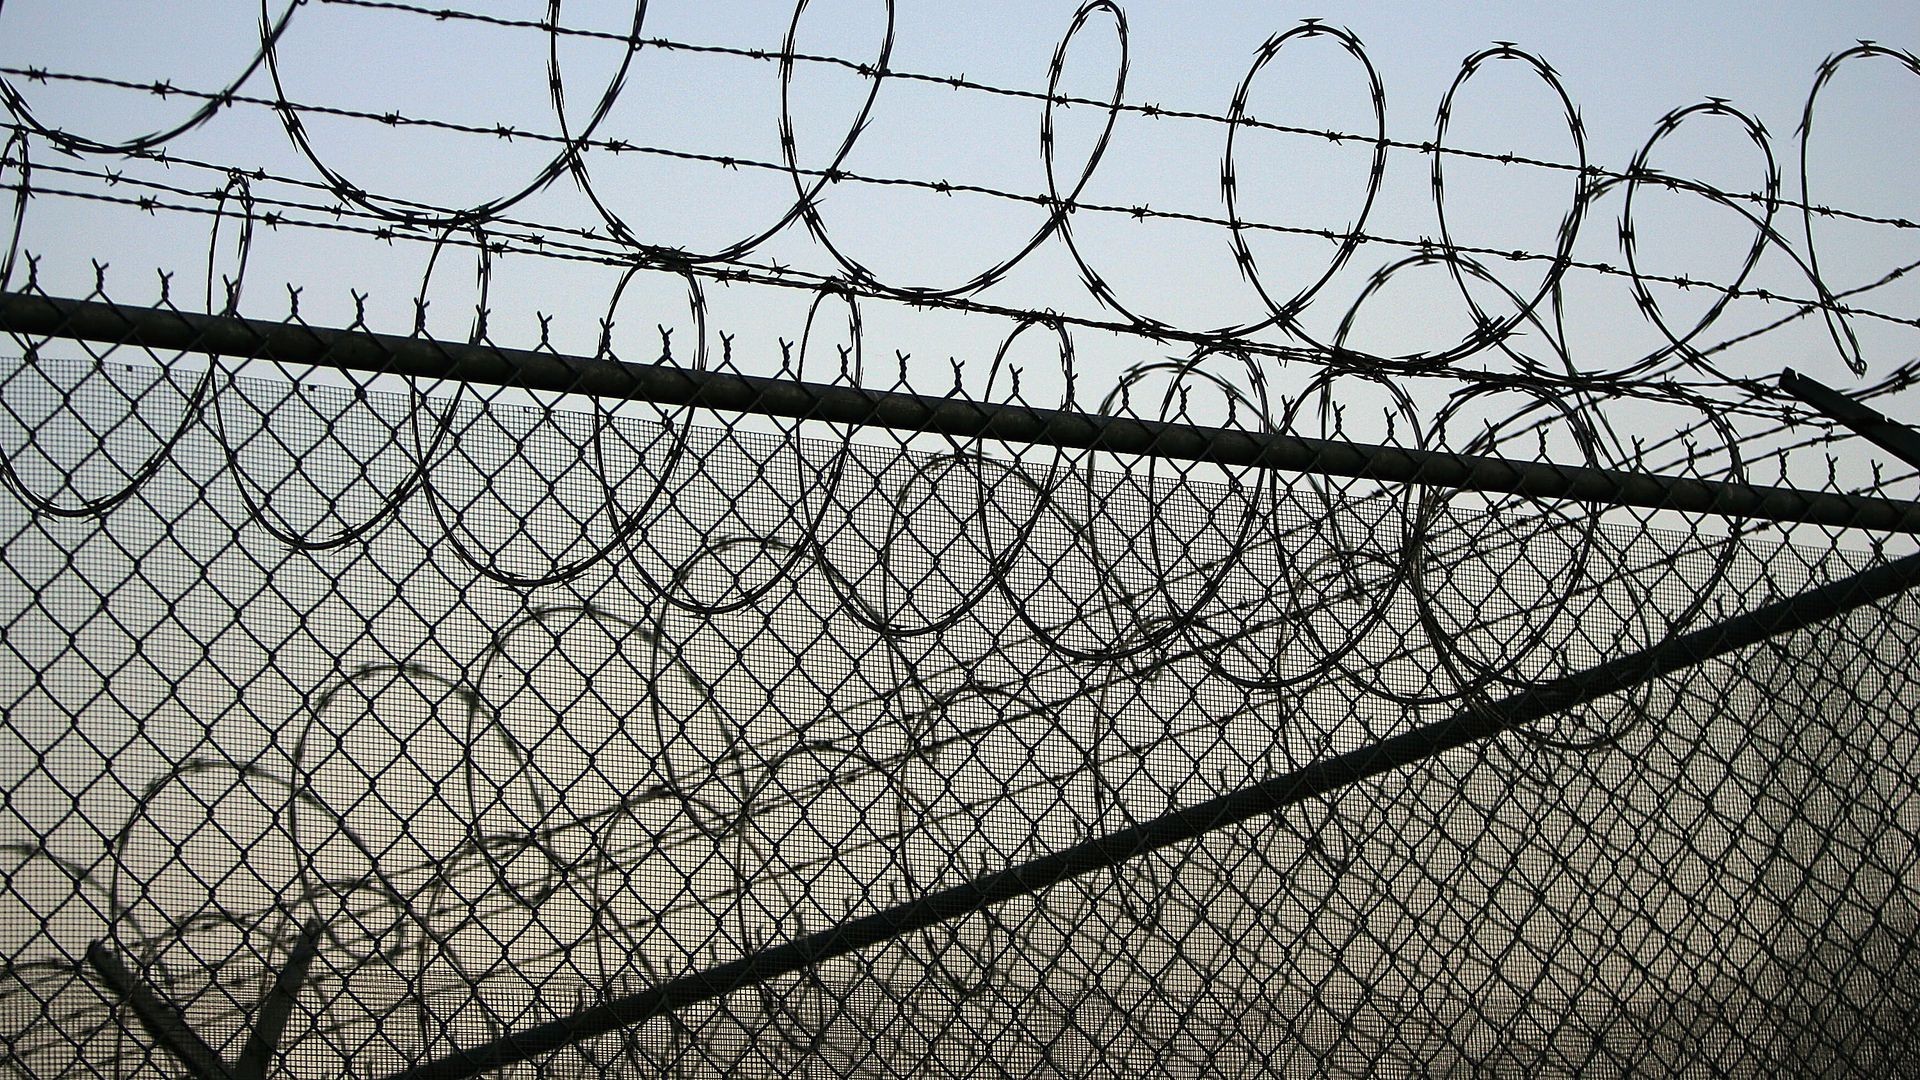 The Santa Barbara County Detention and Correctional Facility.